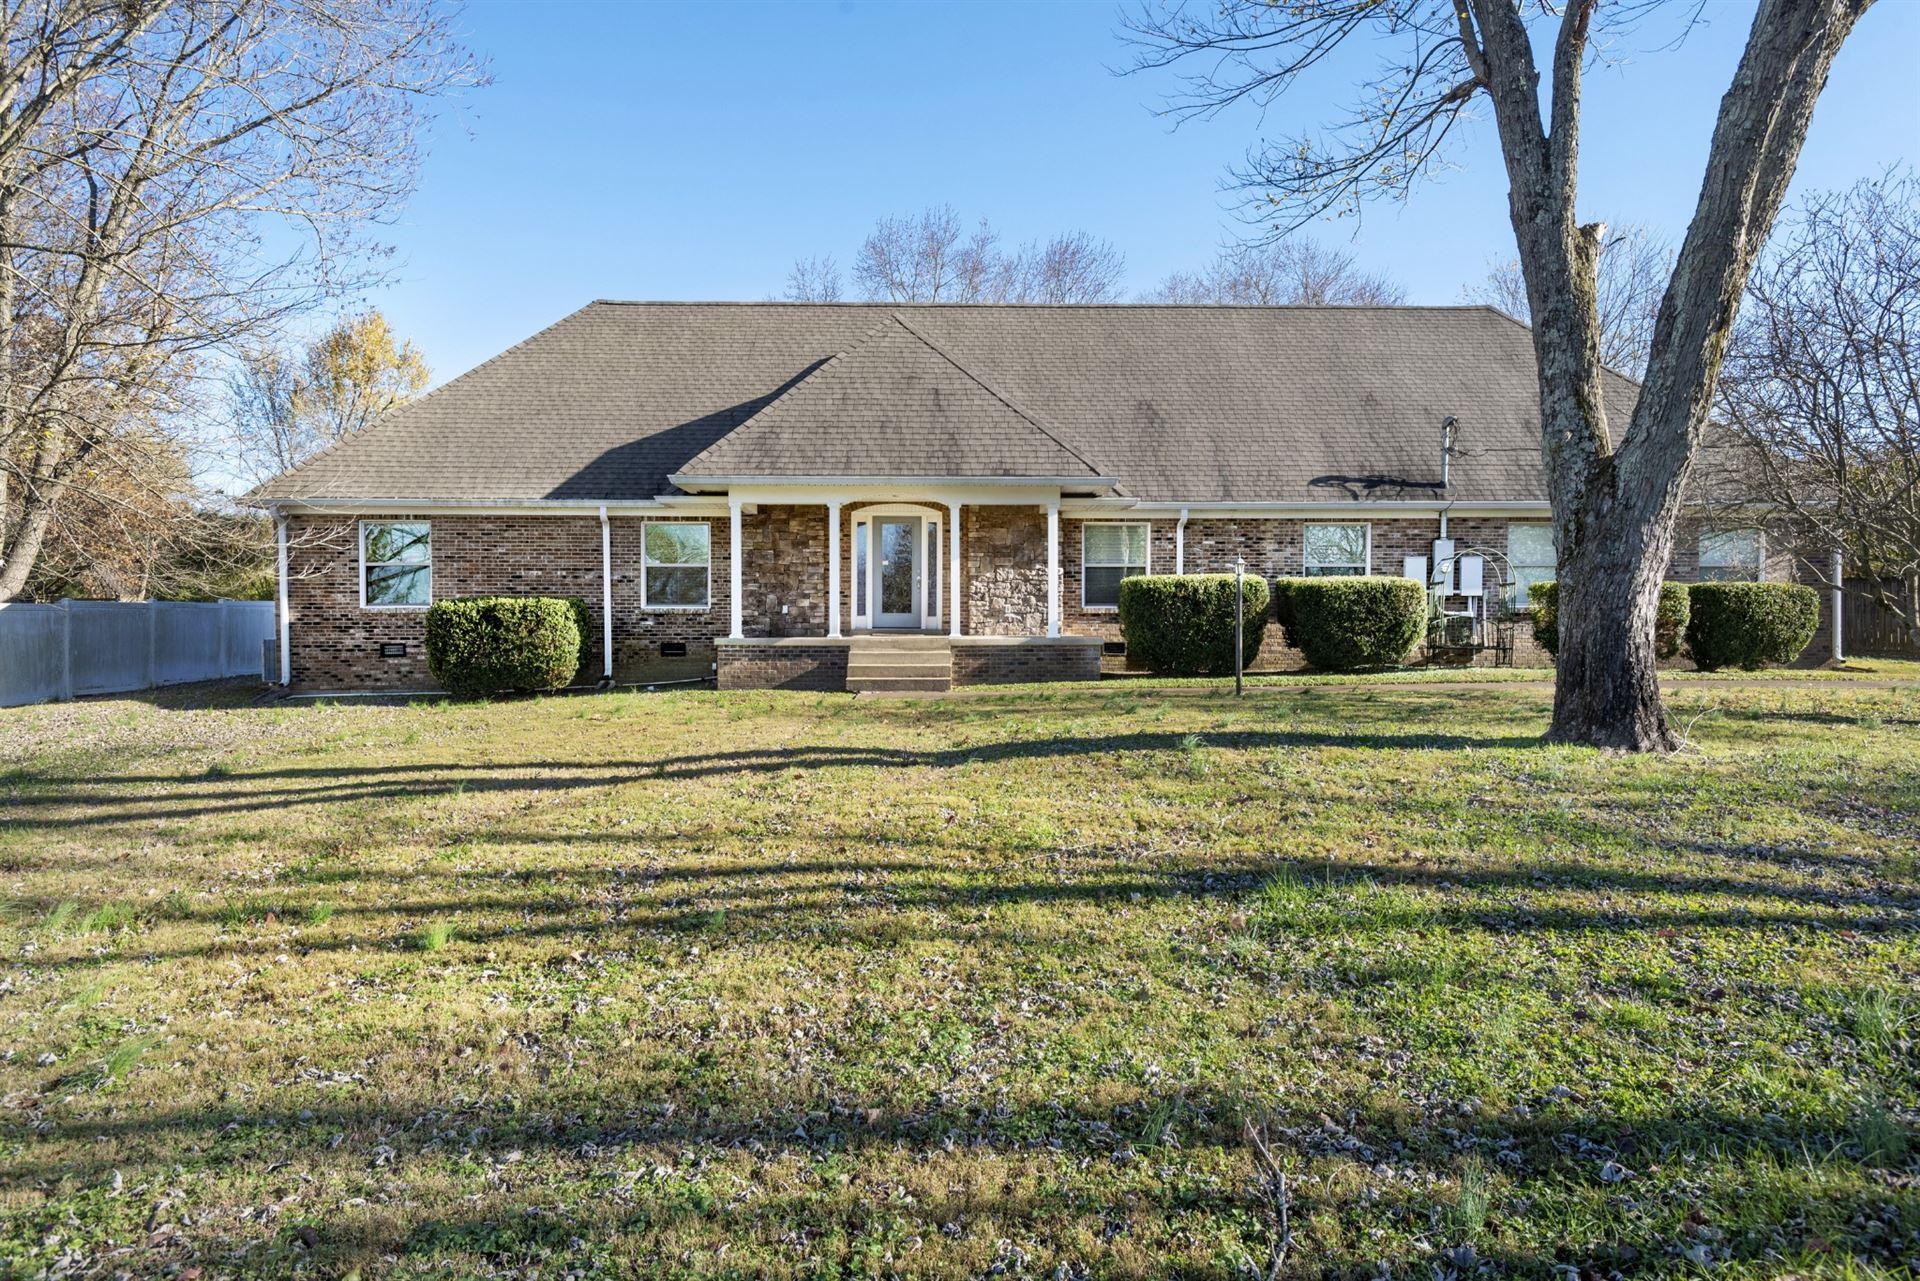 227 Lake Terrace Dr, Hendersonville, TN 37075 - MLS#: 2210900